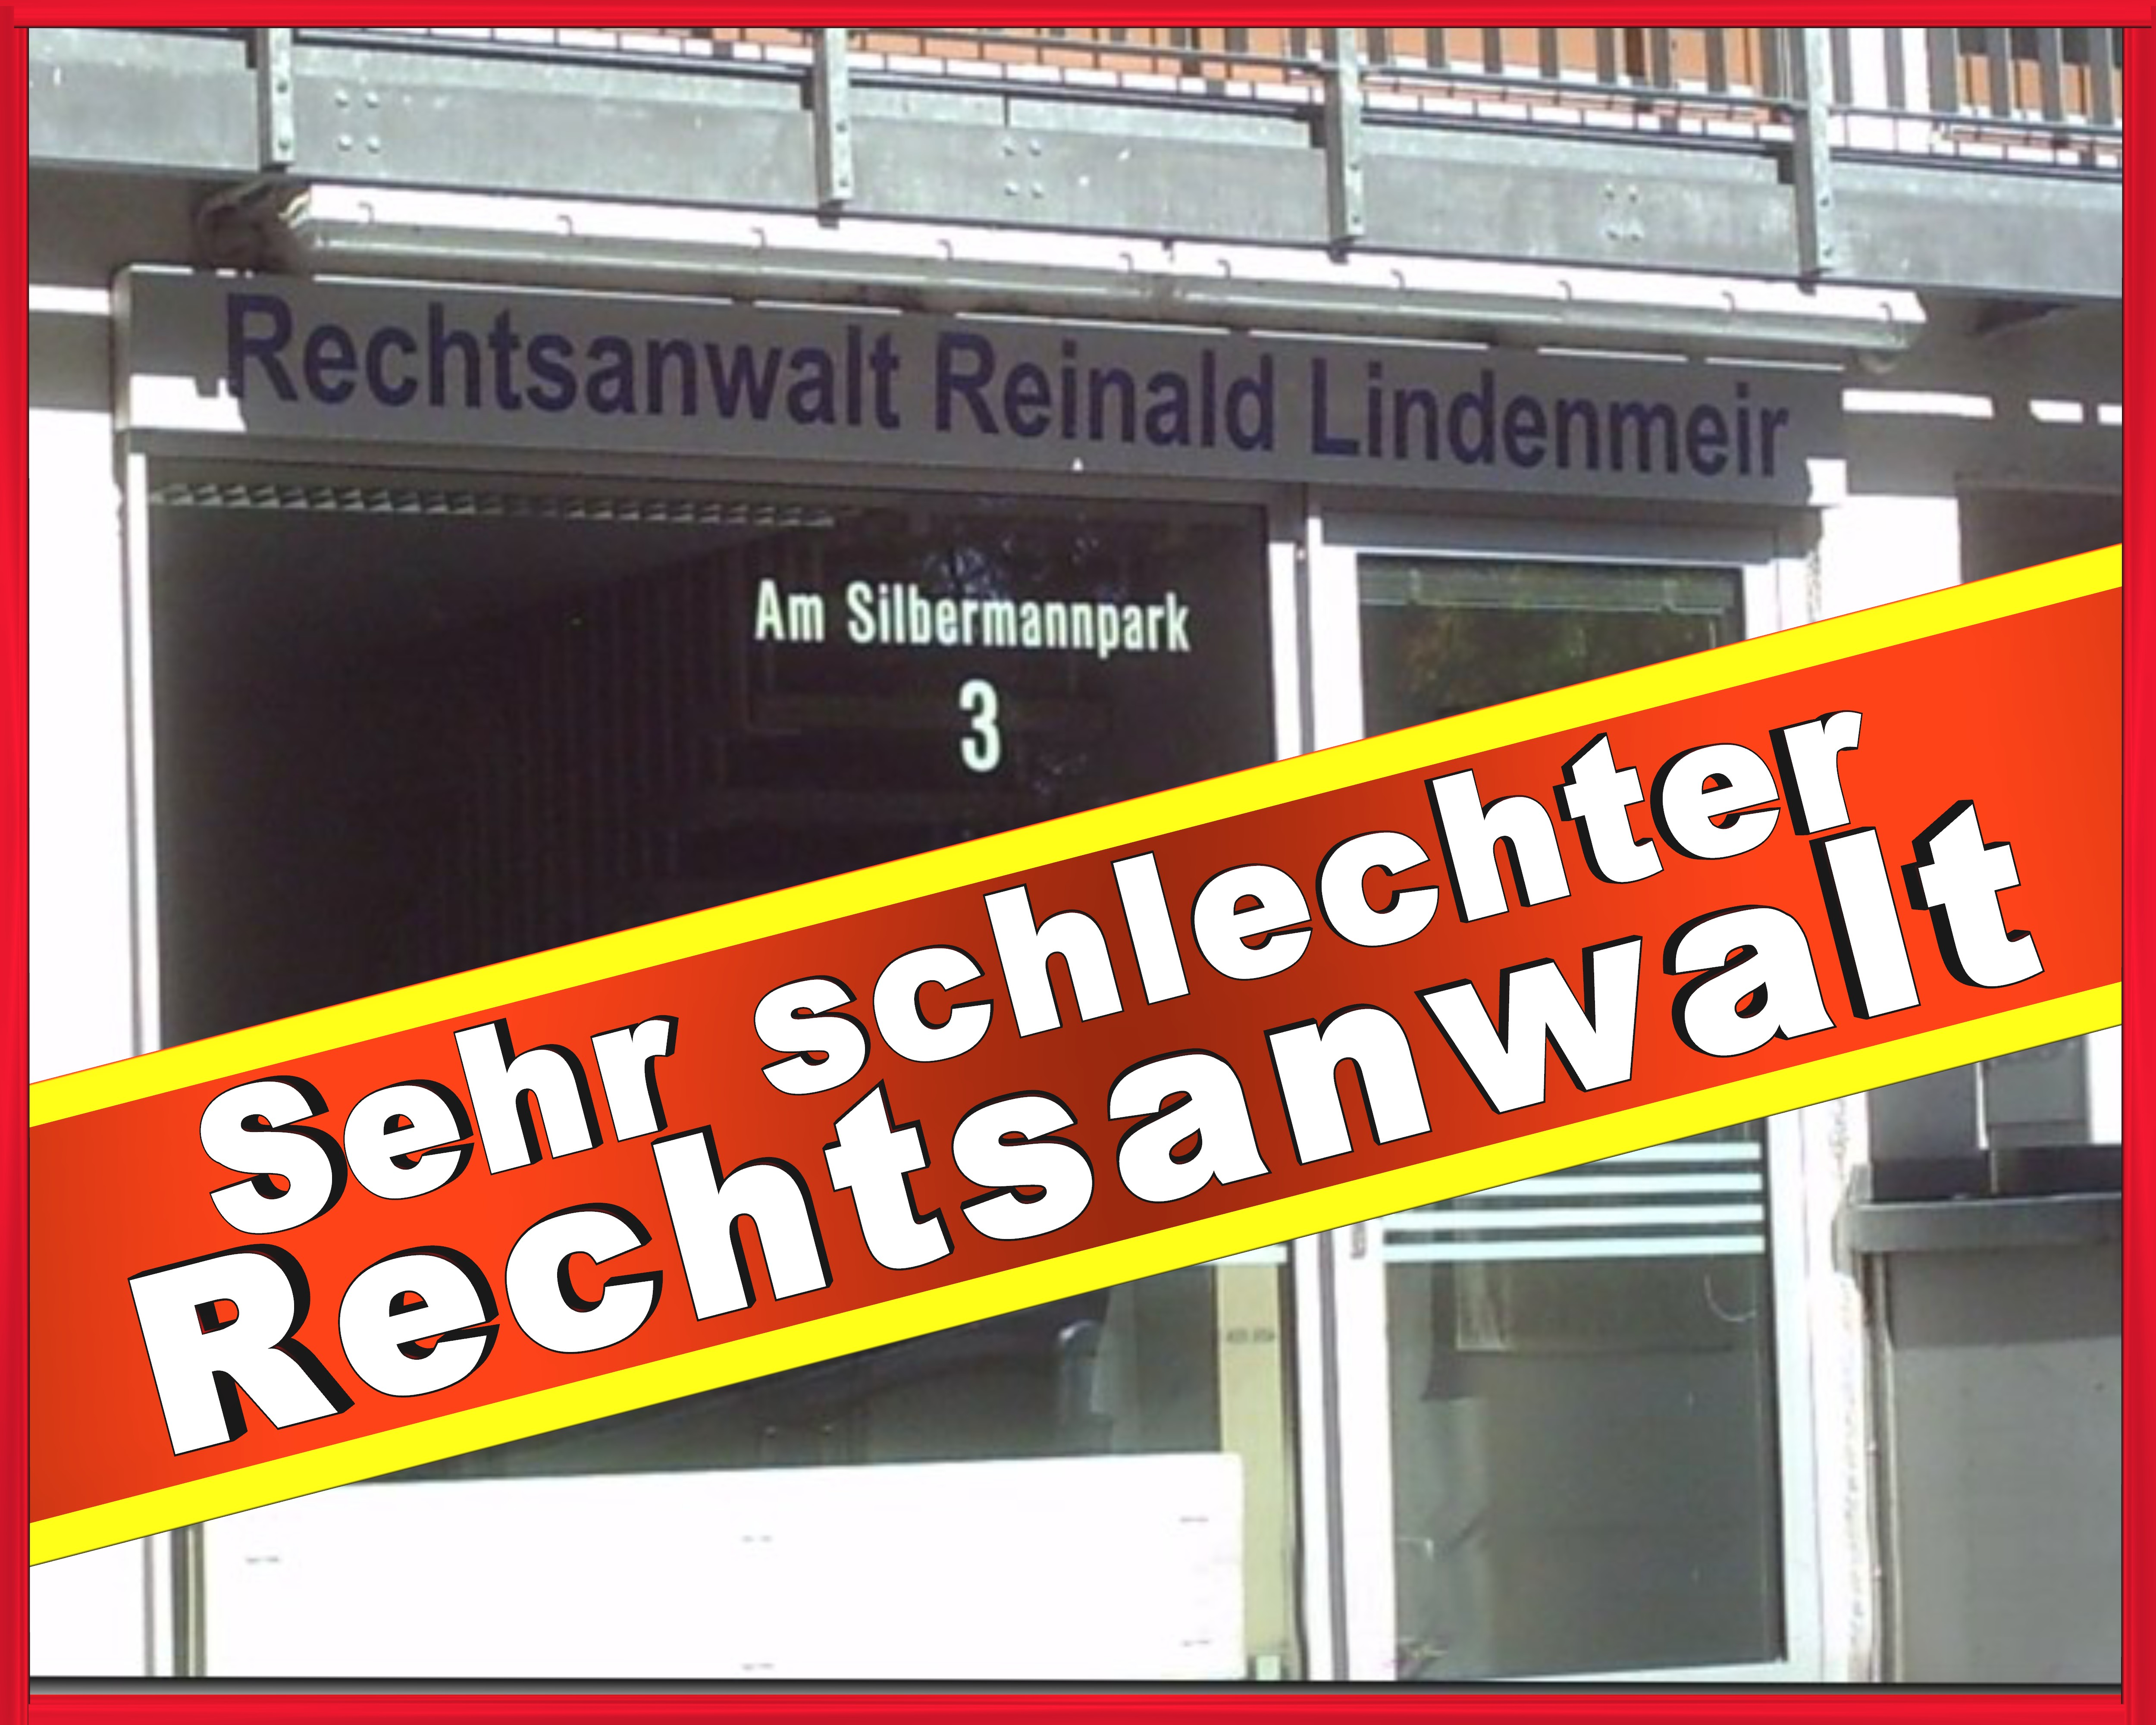 Rechtsanwalt Reinald Lindenmair  Augsburg